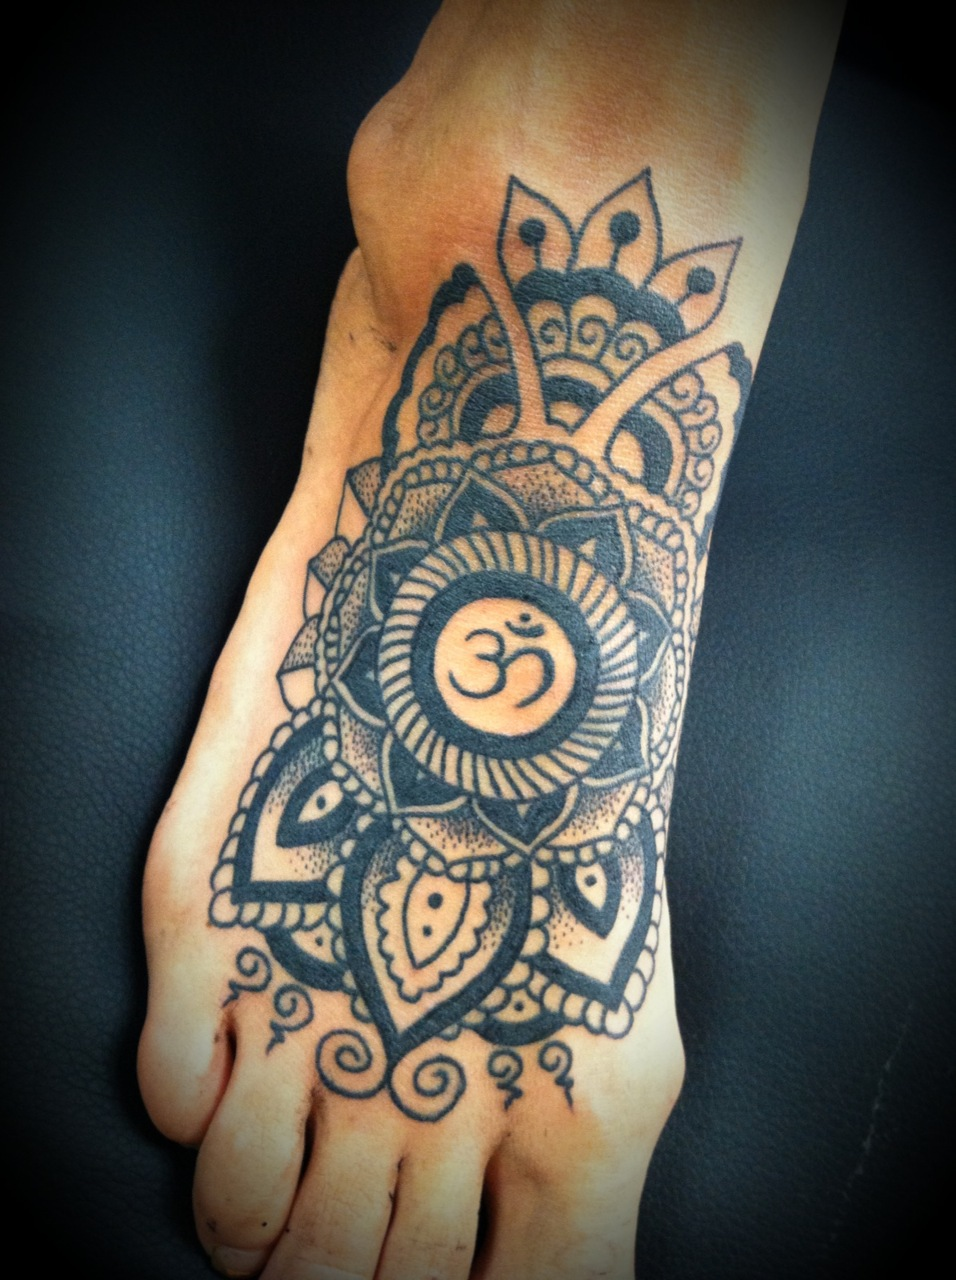 pattern and om sign best tattoo design ideas. Black Bedroom Furniture Sets. Home Design Ideas